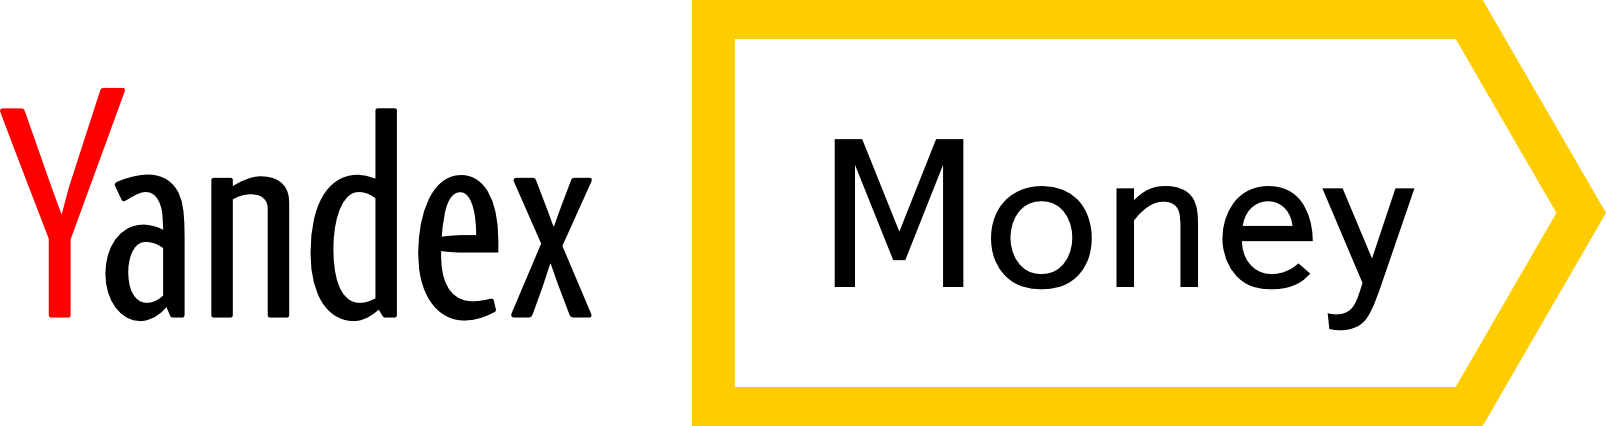 Yandex logo graphics - Yandex Logo PNG